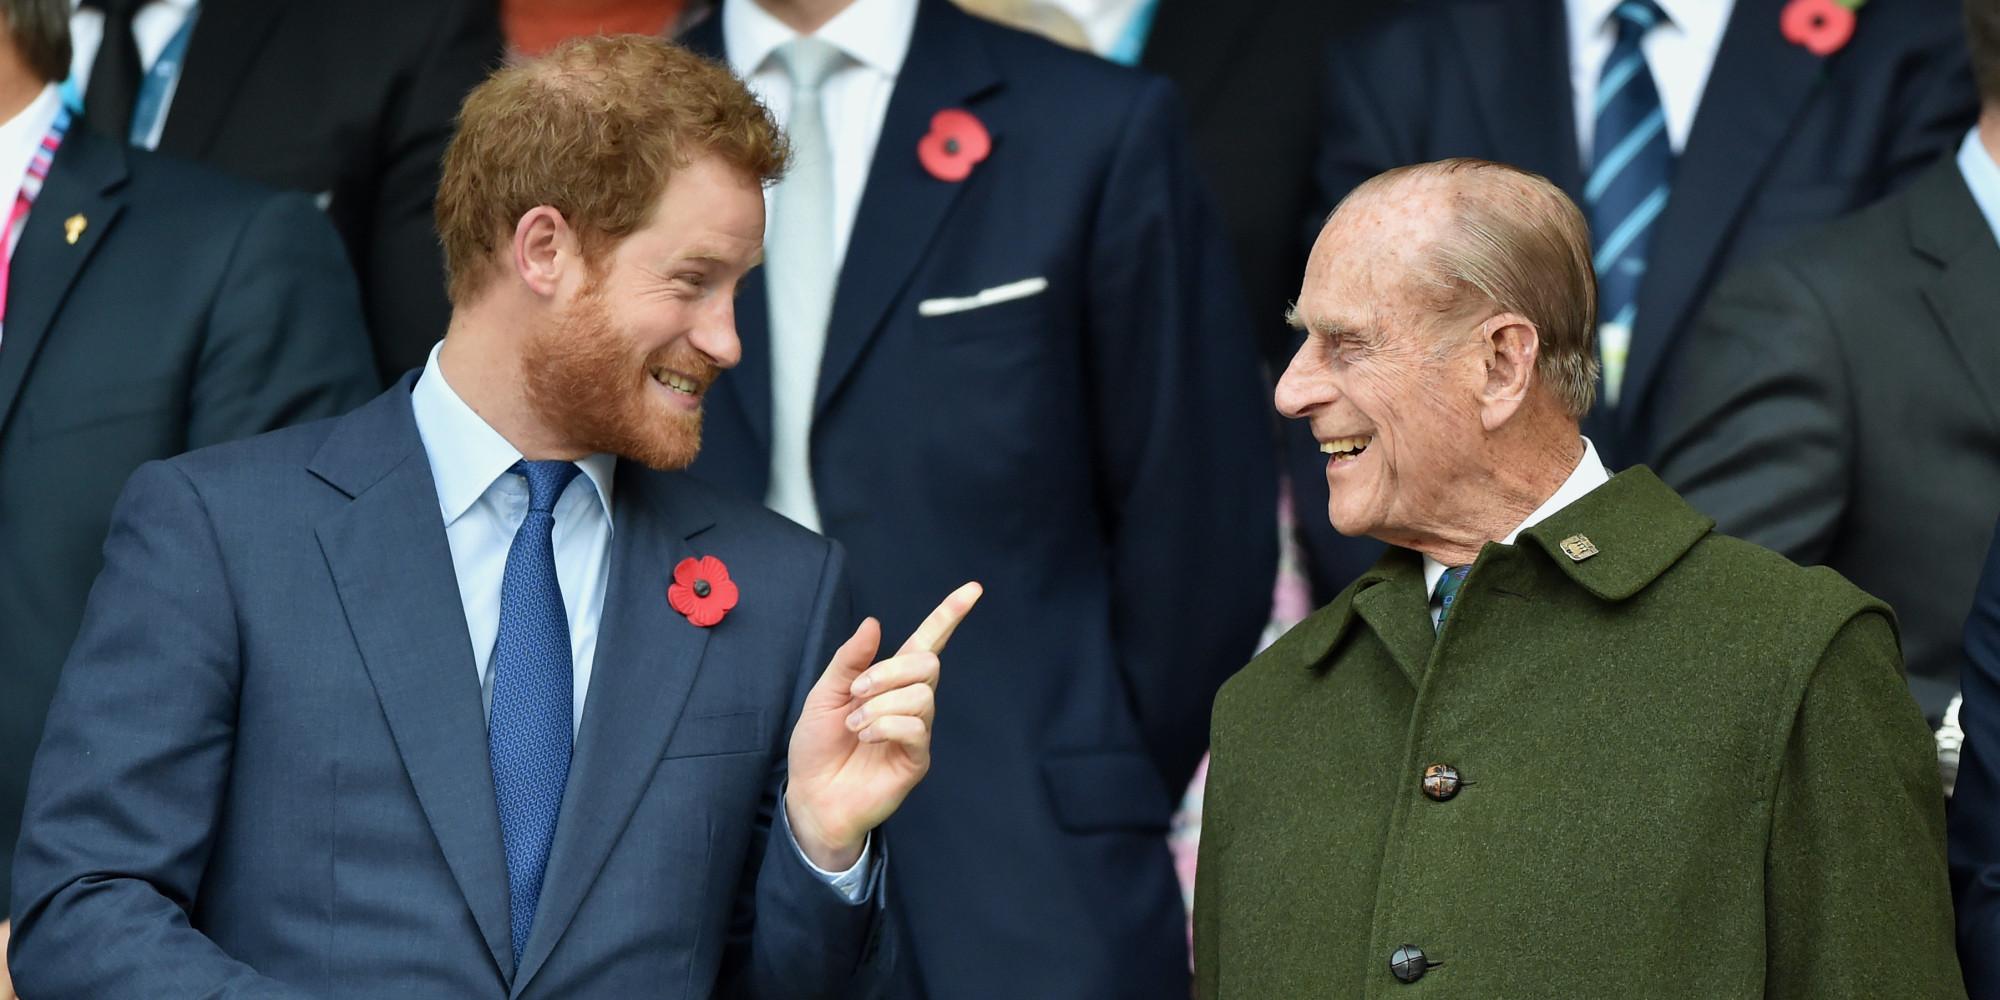 Duke Of Edinburgh Beats Prince Harry On GQ 2016 Best ... Young Prince Philip Prince Harry